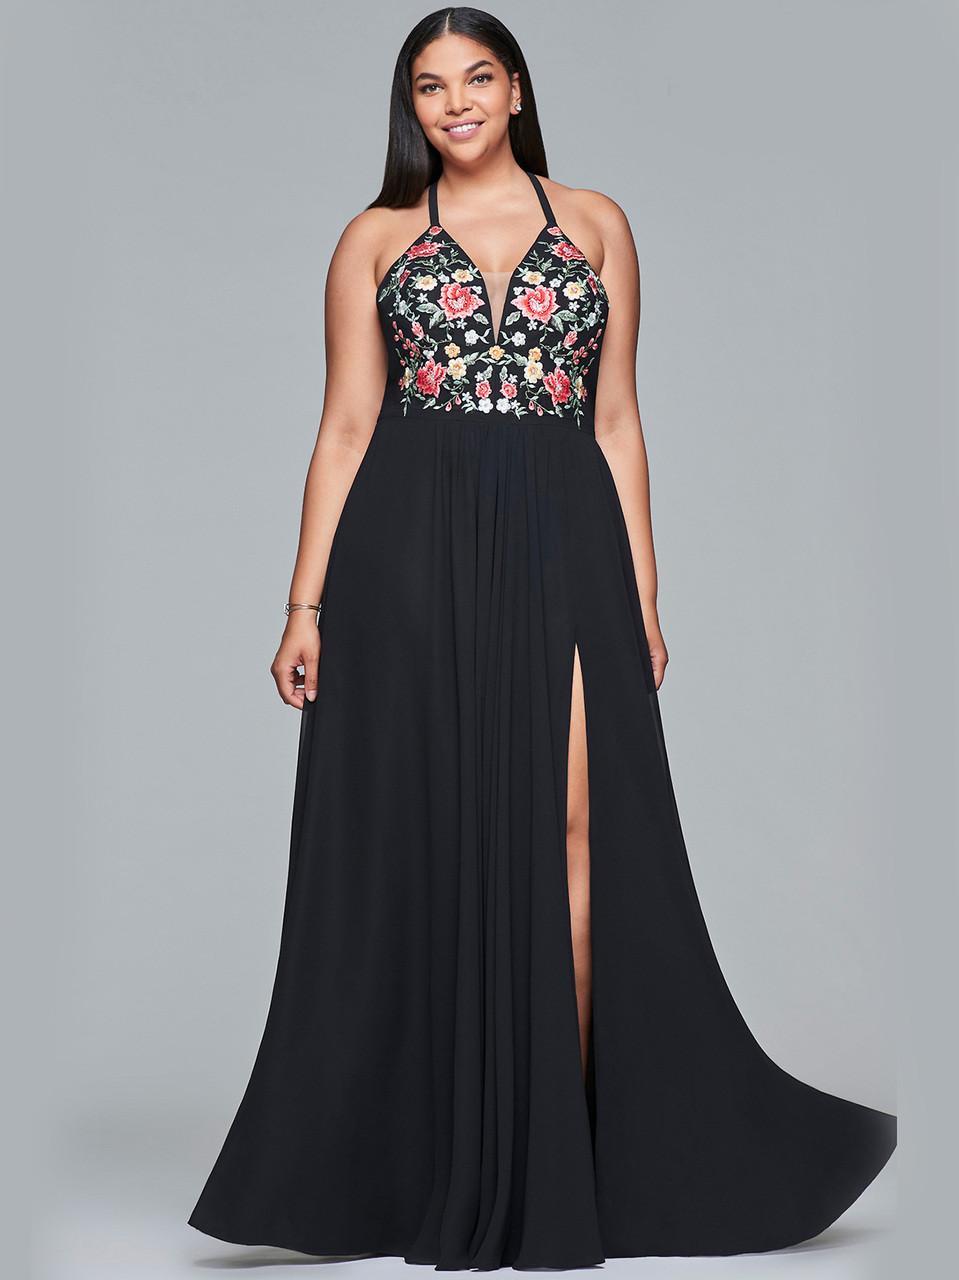 5a08b322541 V-neck A-line Faviana Curves Dress 9435